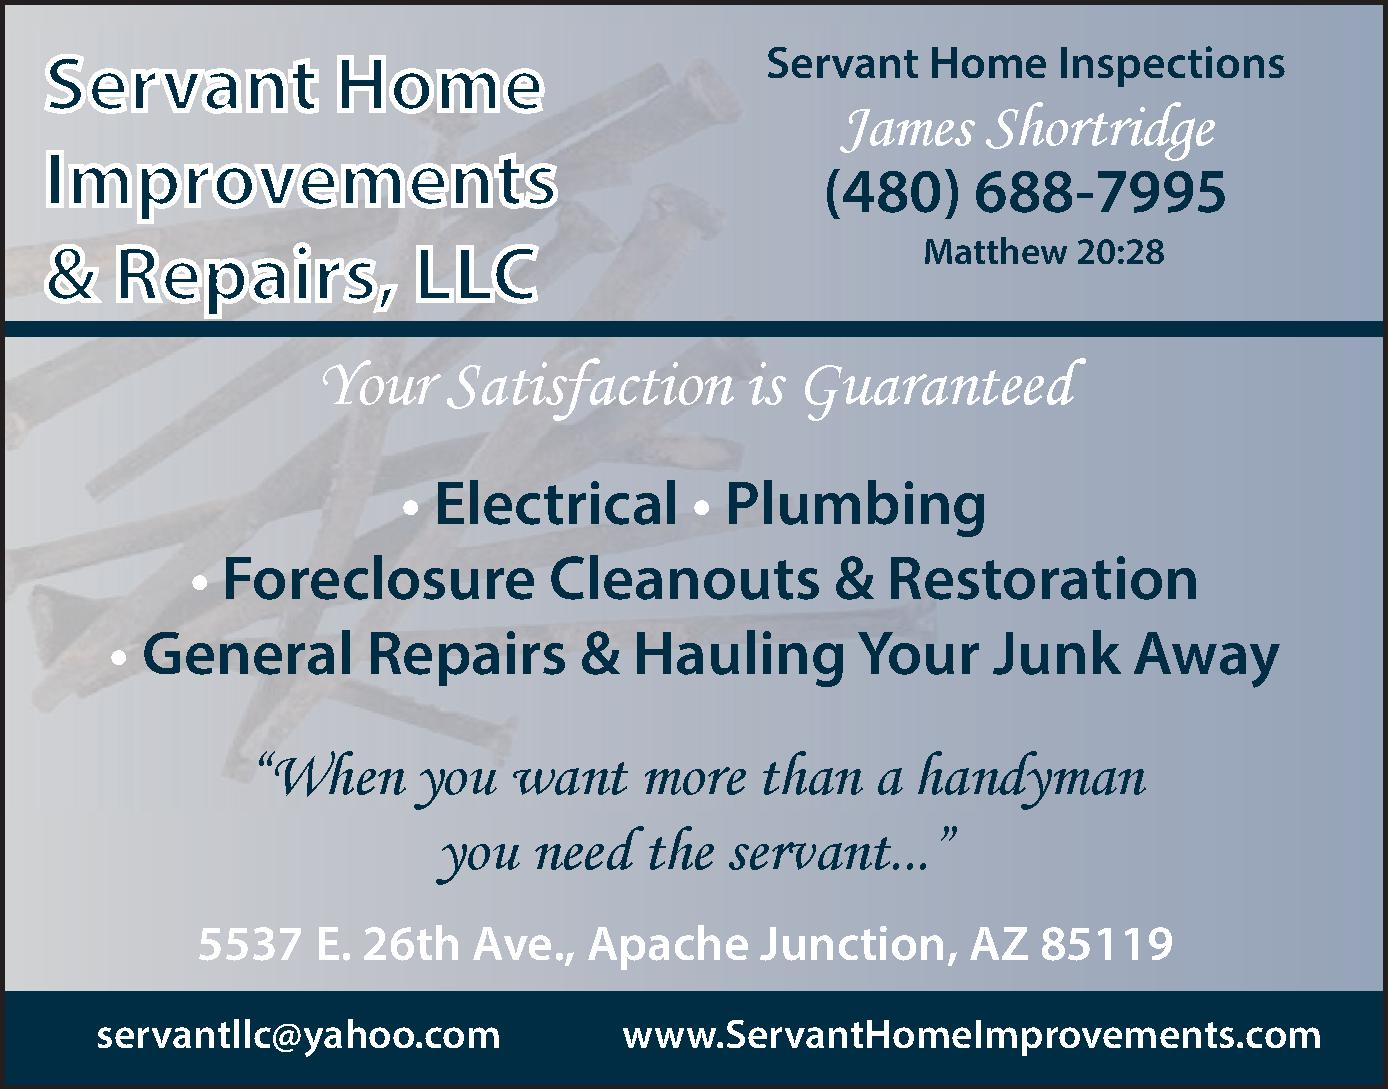 Servant Home Improvements & Repairs